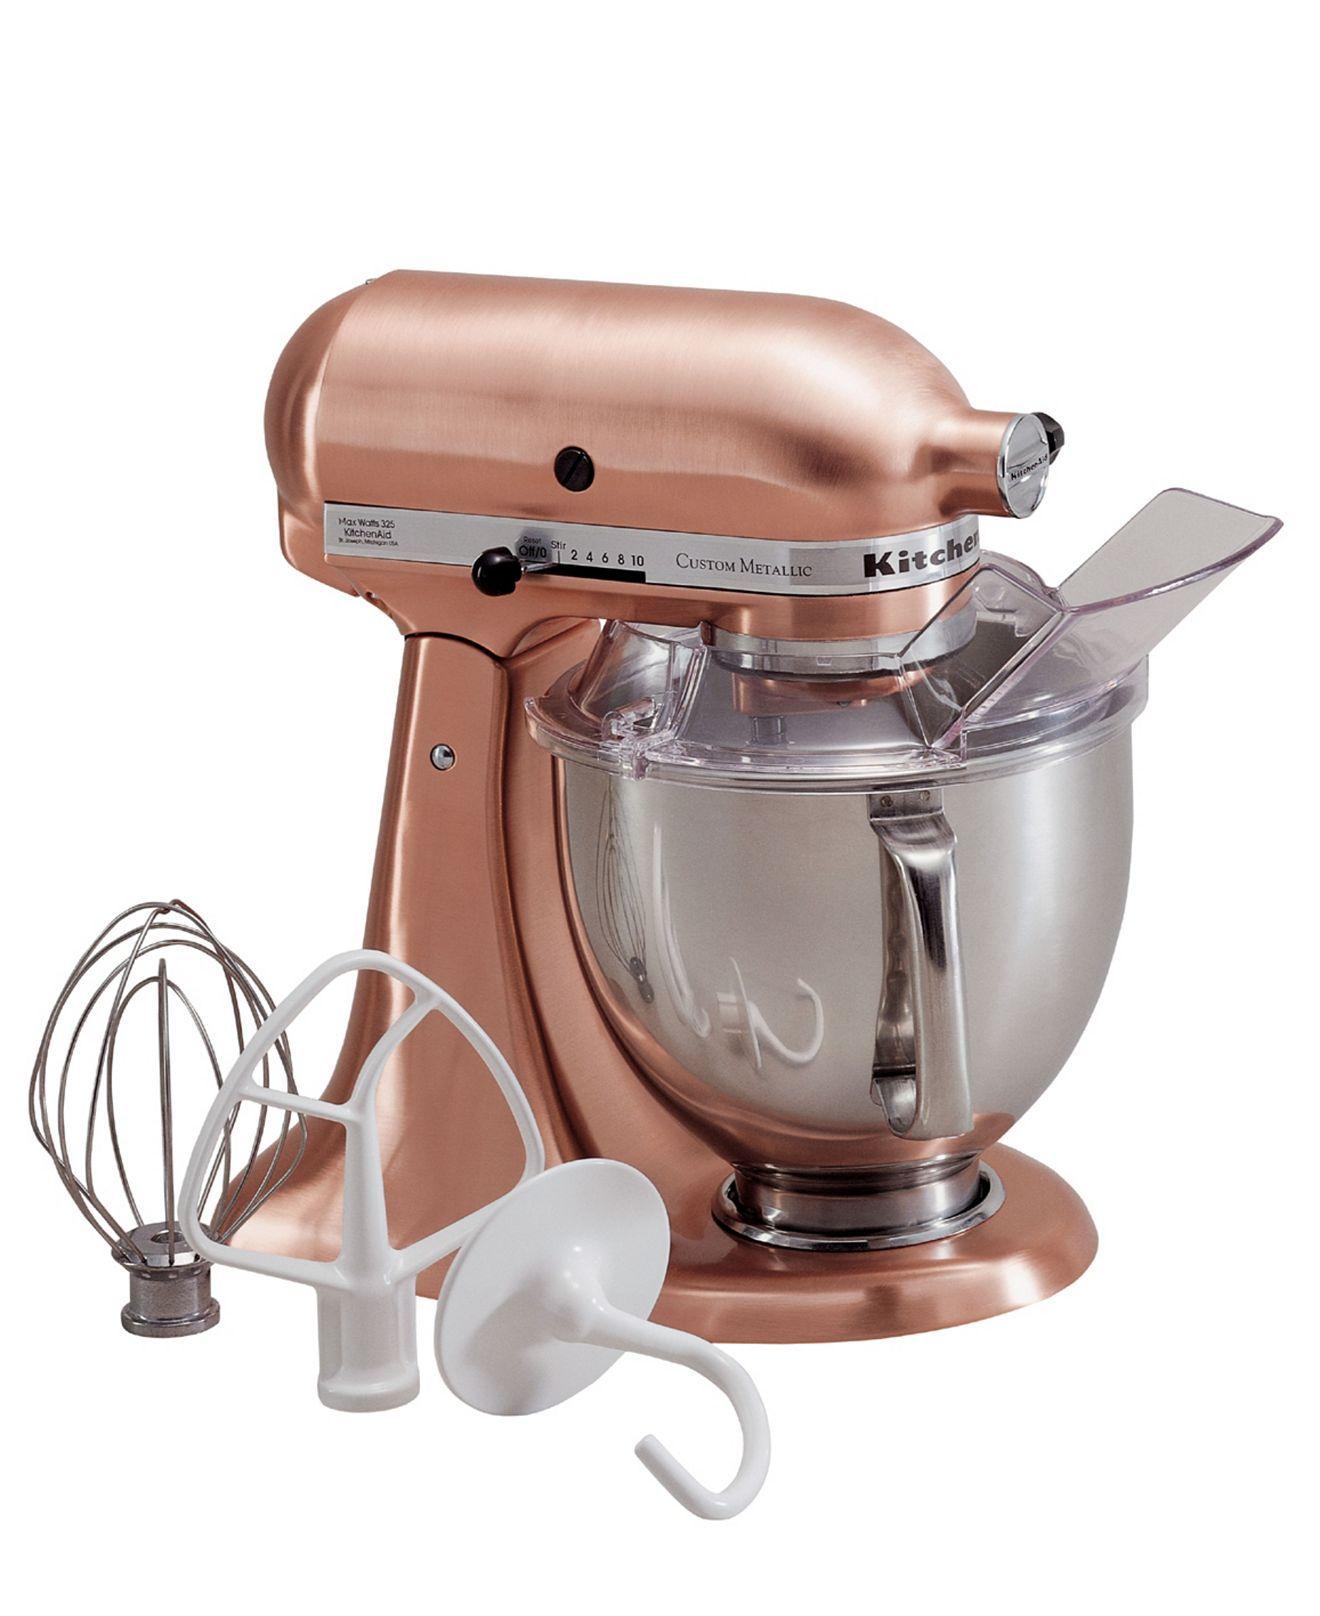 Artisan 5 qt custom metallic stand mixer ksm152ps